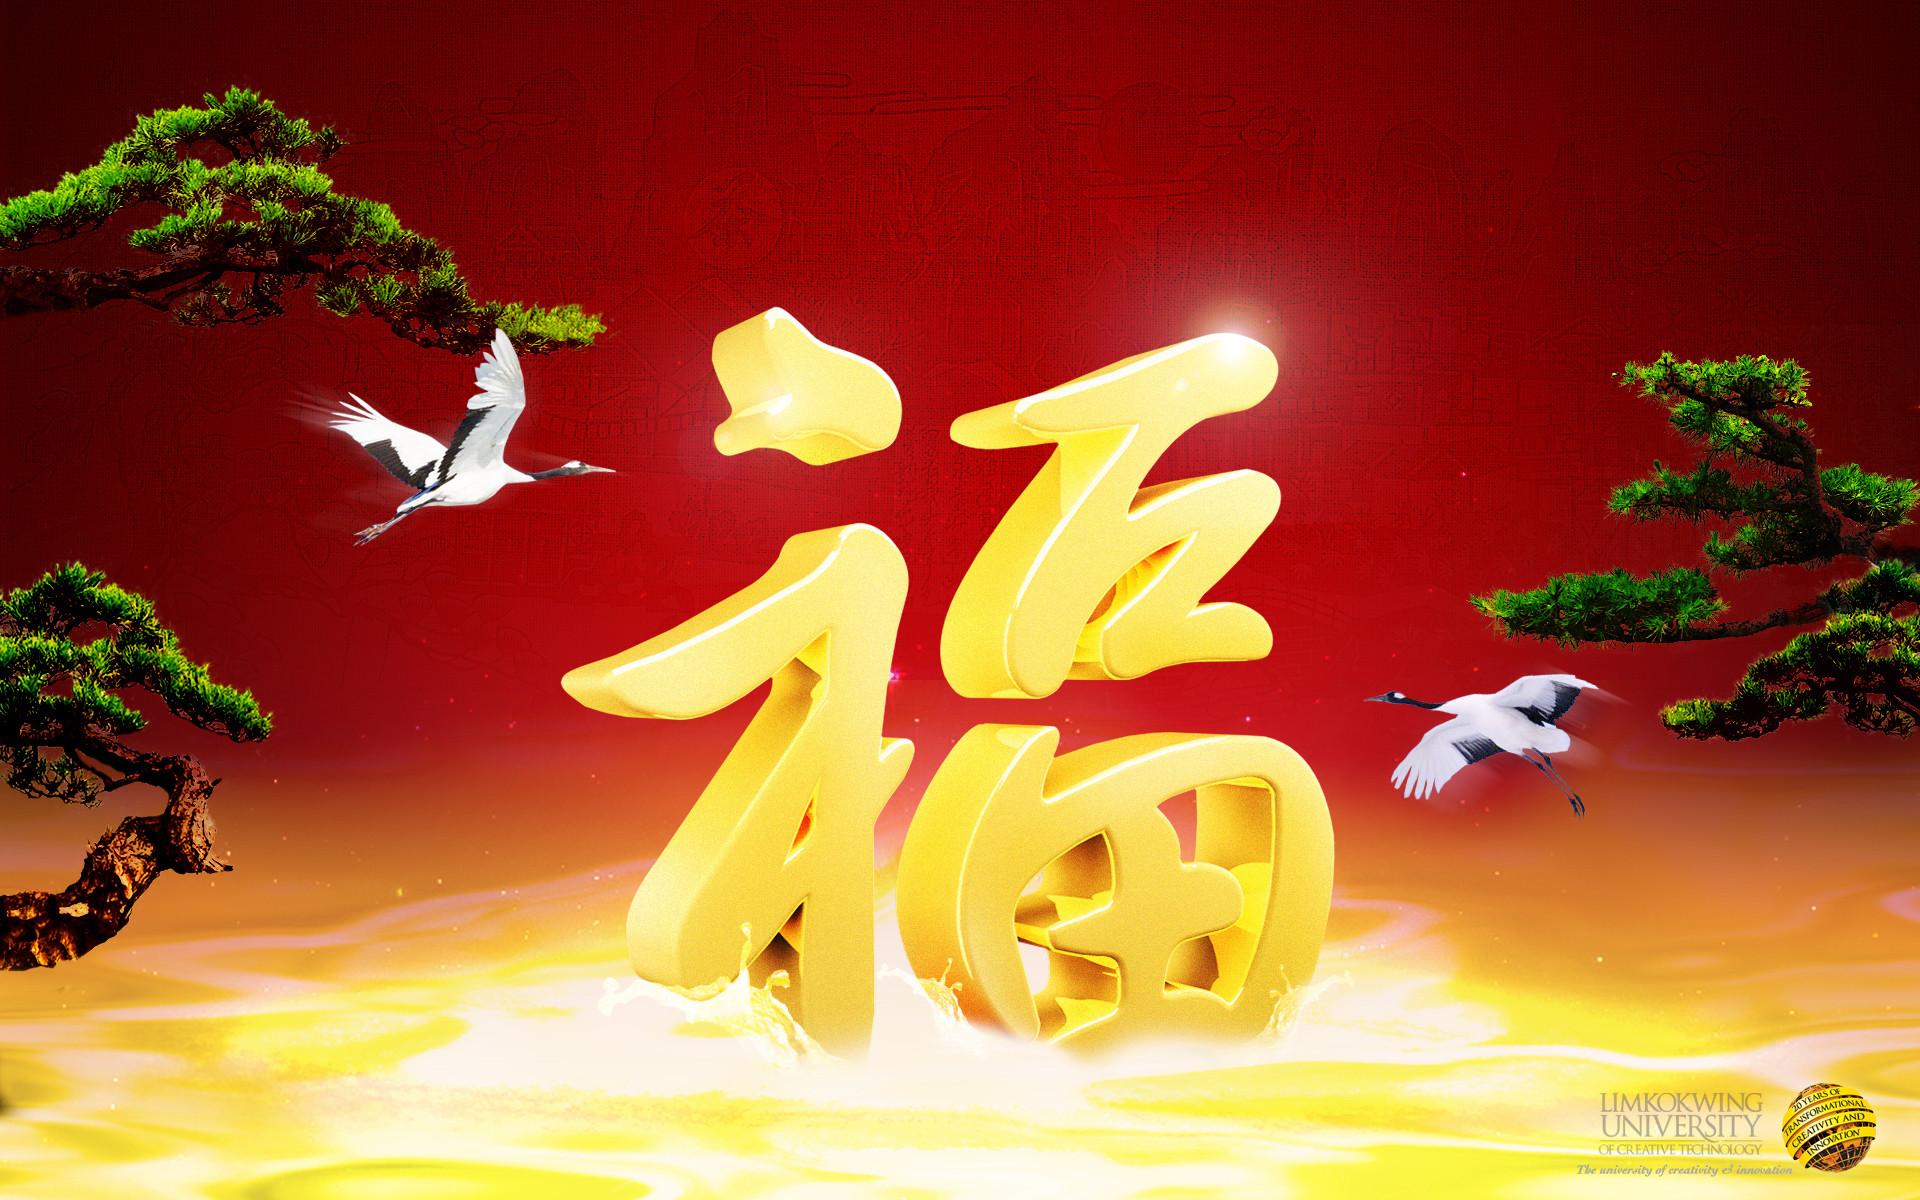 1900 x 1200 1600 x 1200 1024 x 768 · Limkokwing University · Wallpaper;  Golden Chinese New Year